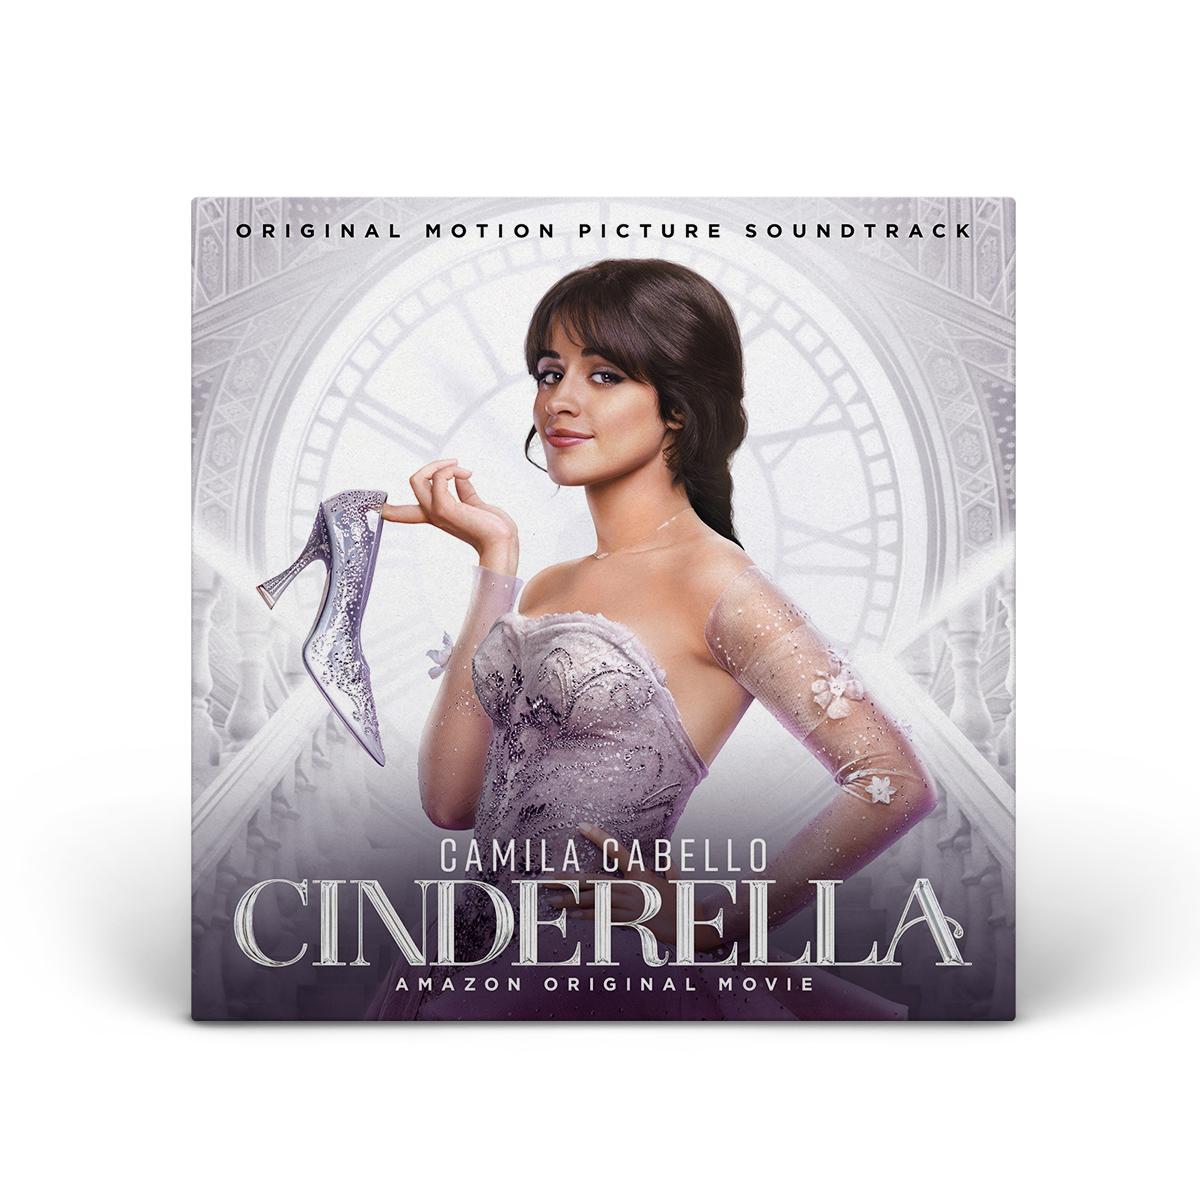 Cinderella (Original Motion Picture Soundtrack) Deluxe Digital Download